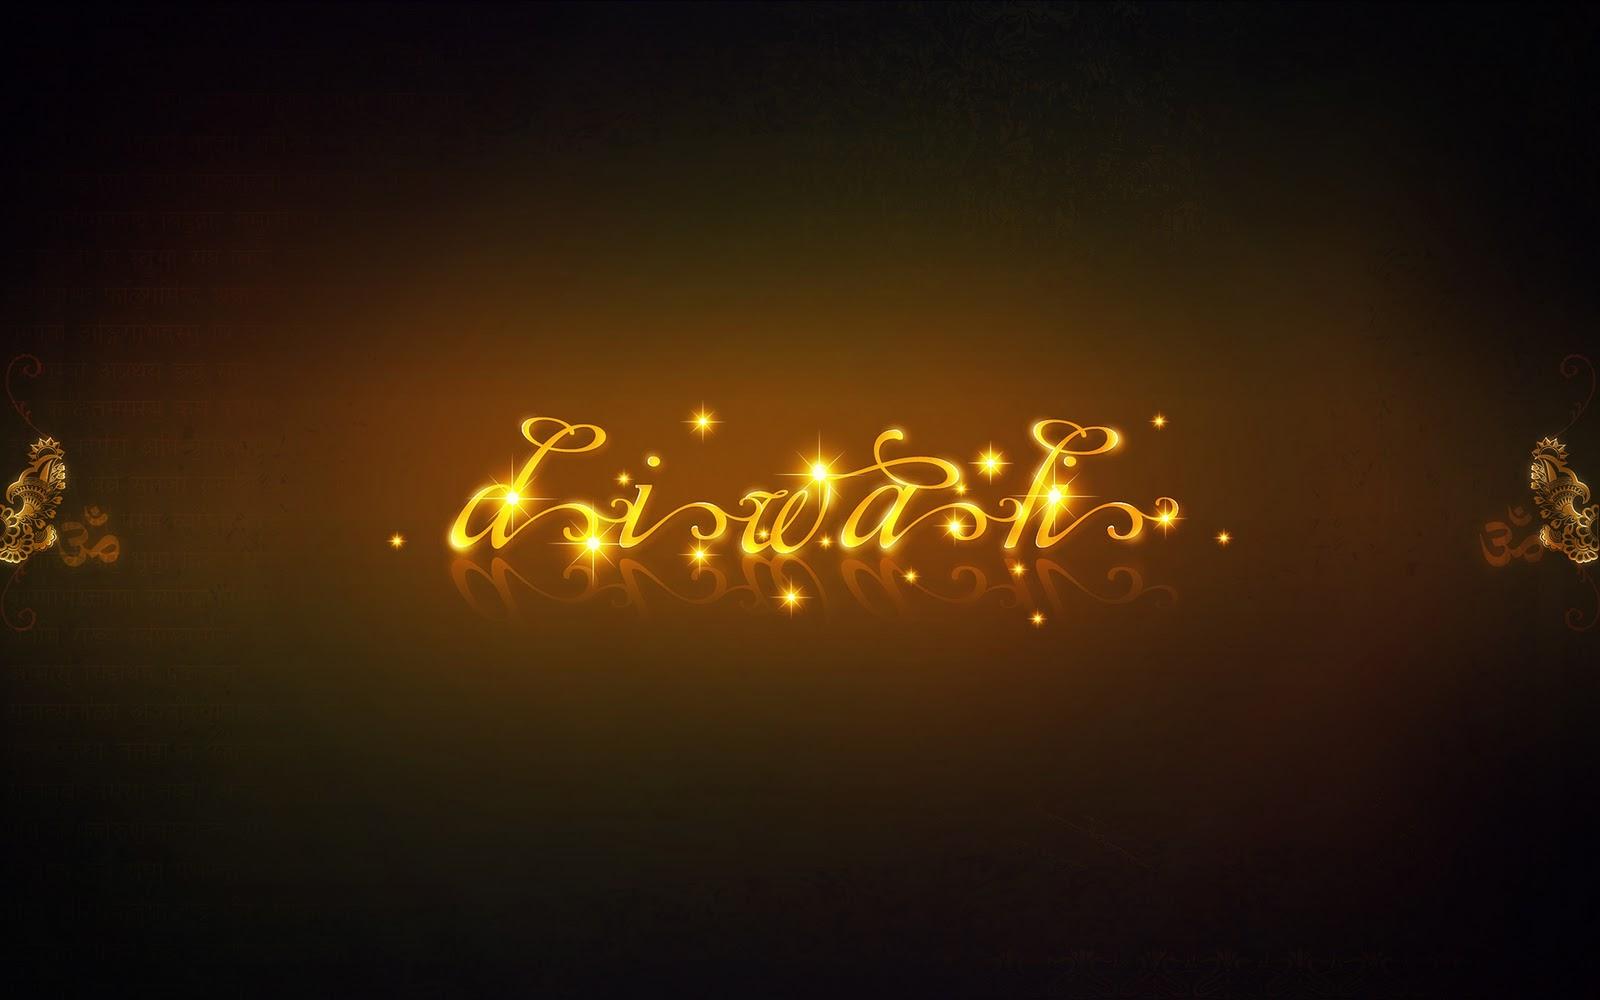 Happy Diwali Wishes 3d Greetings With Laxmiji And Ganpati